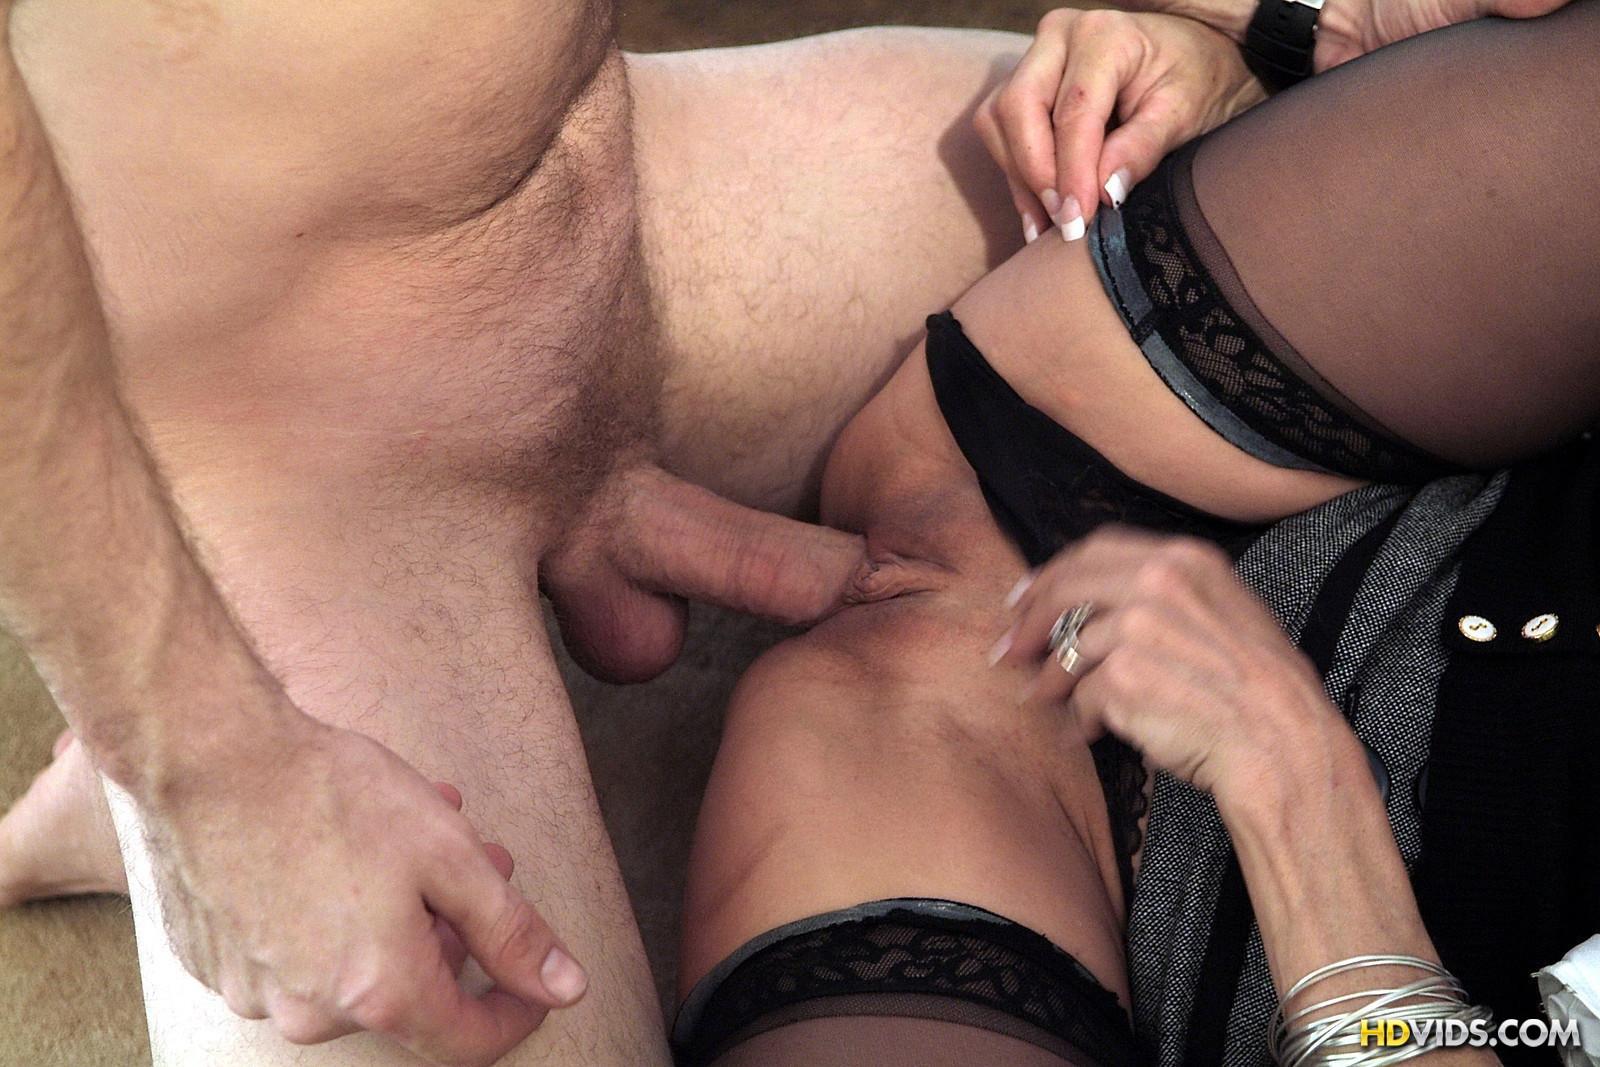 Секс босса и секретарши 1 фотография